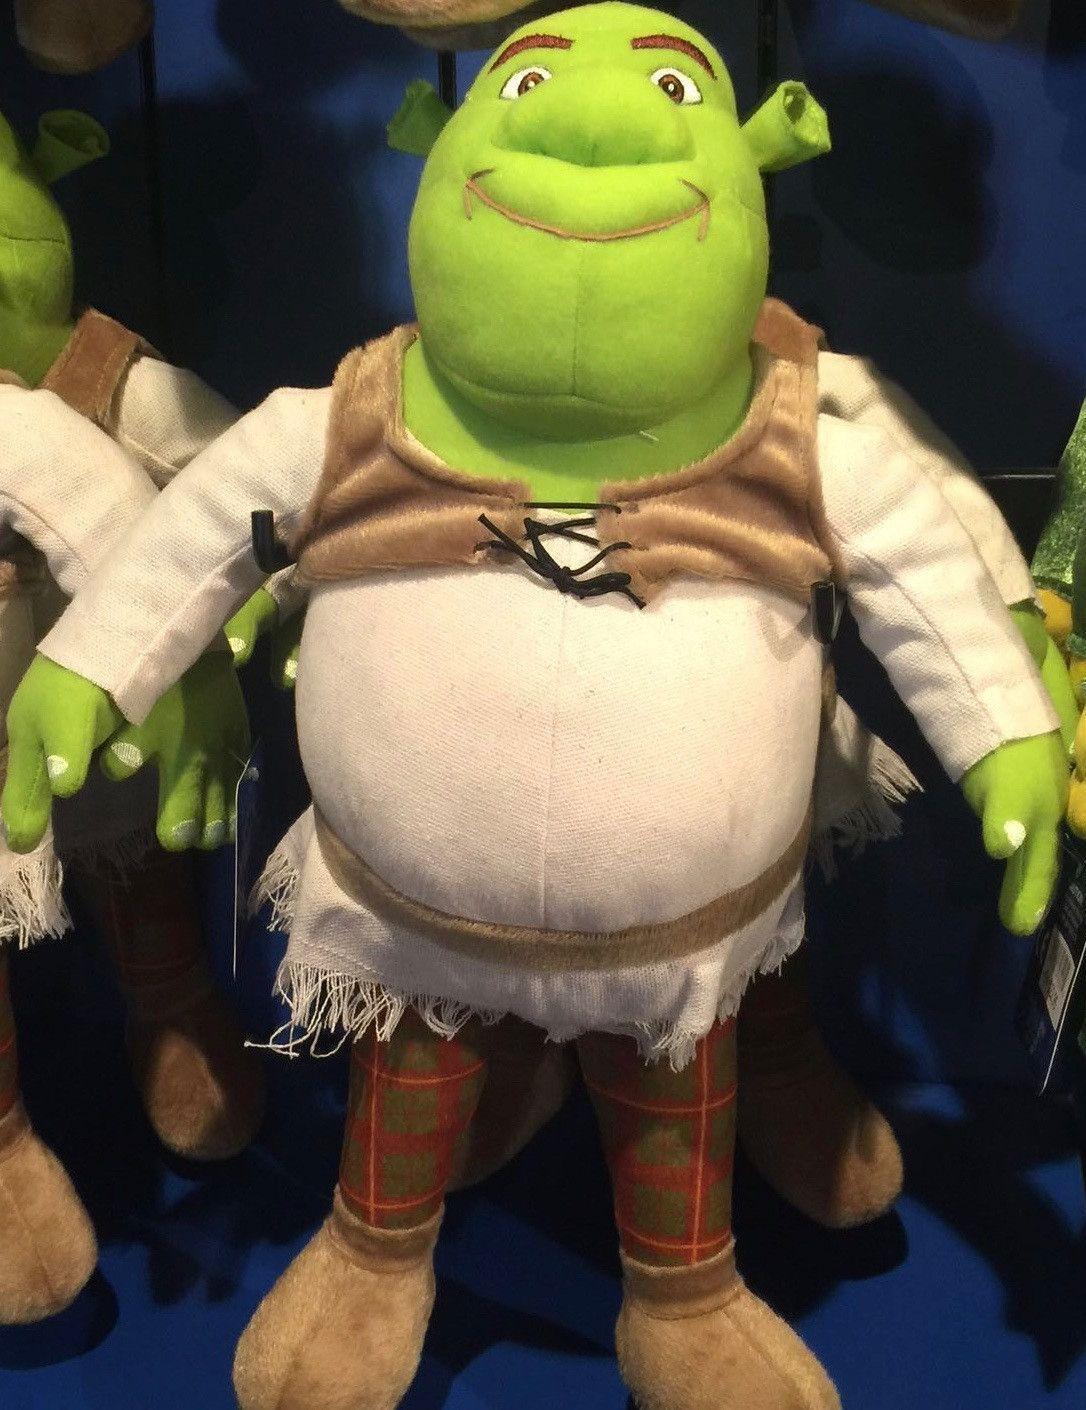 Universal Studios Baby Girl Shrek Plush Toy New With Tags